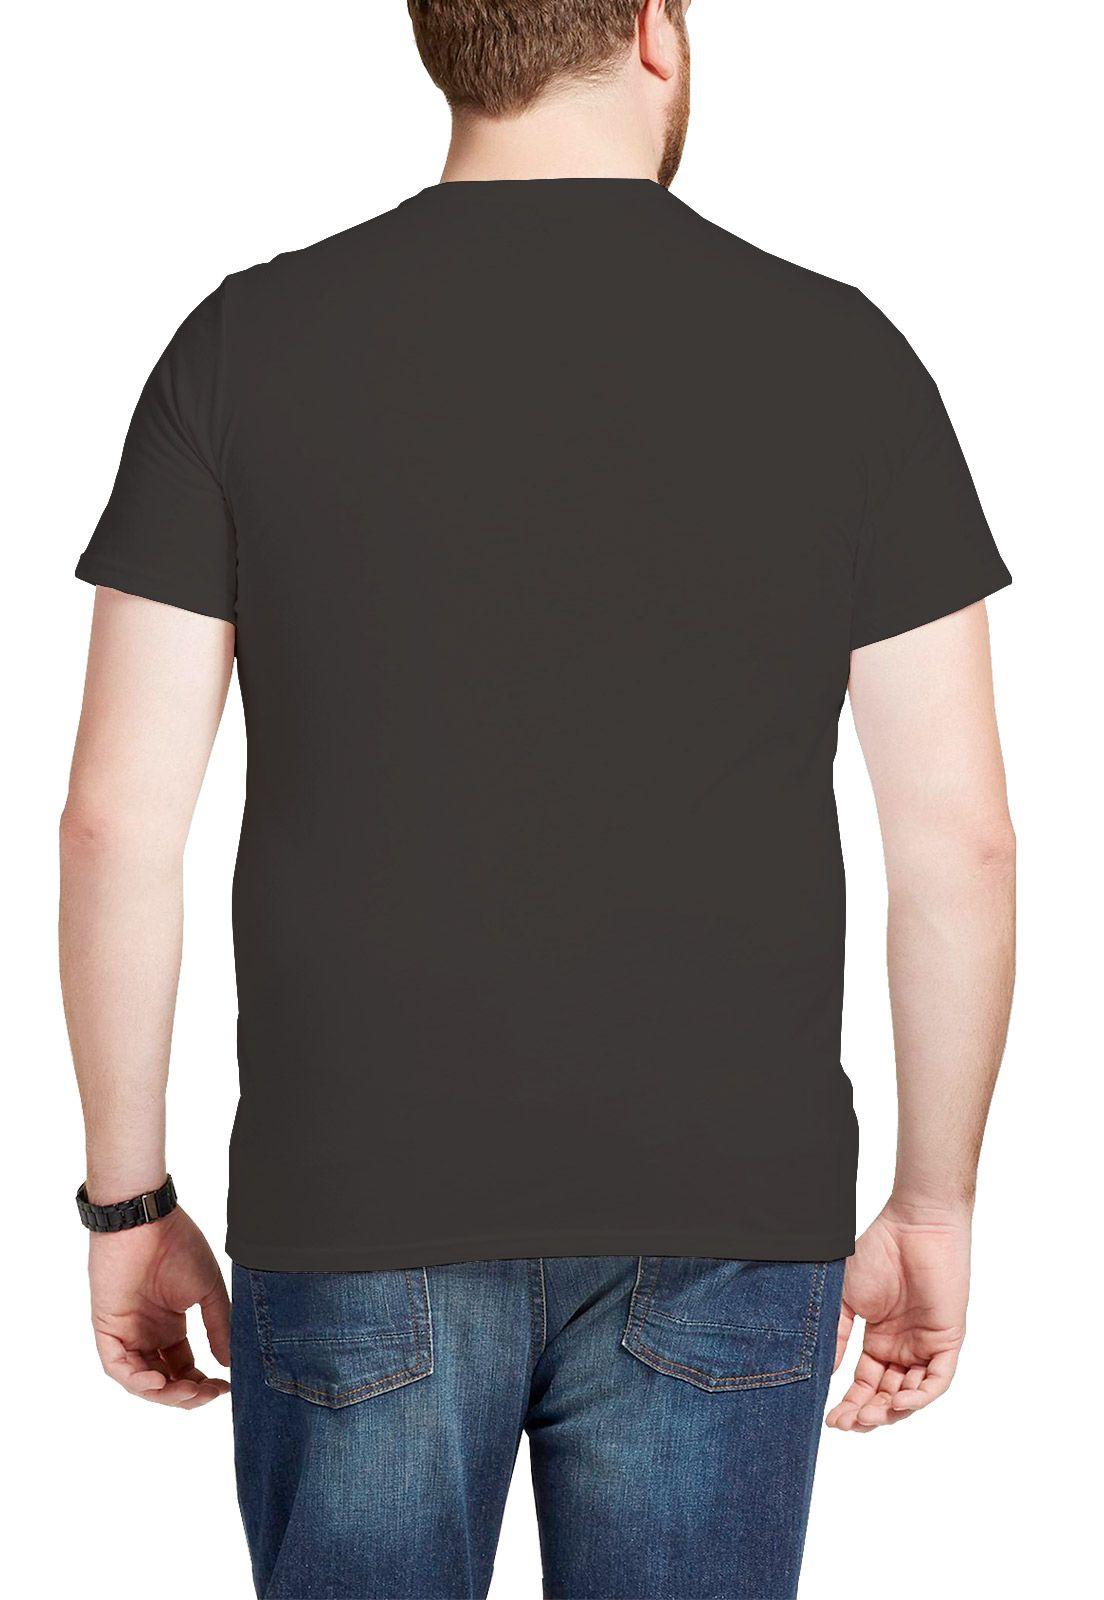 Camiseta Amazônia Básica Árvore Bordada Gola V - Cinza